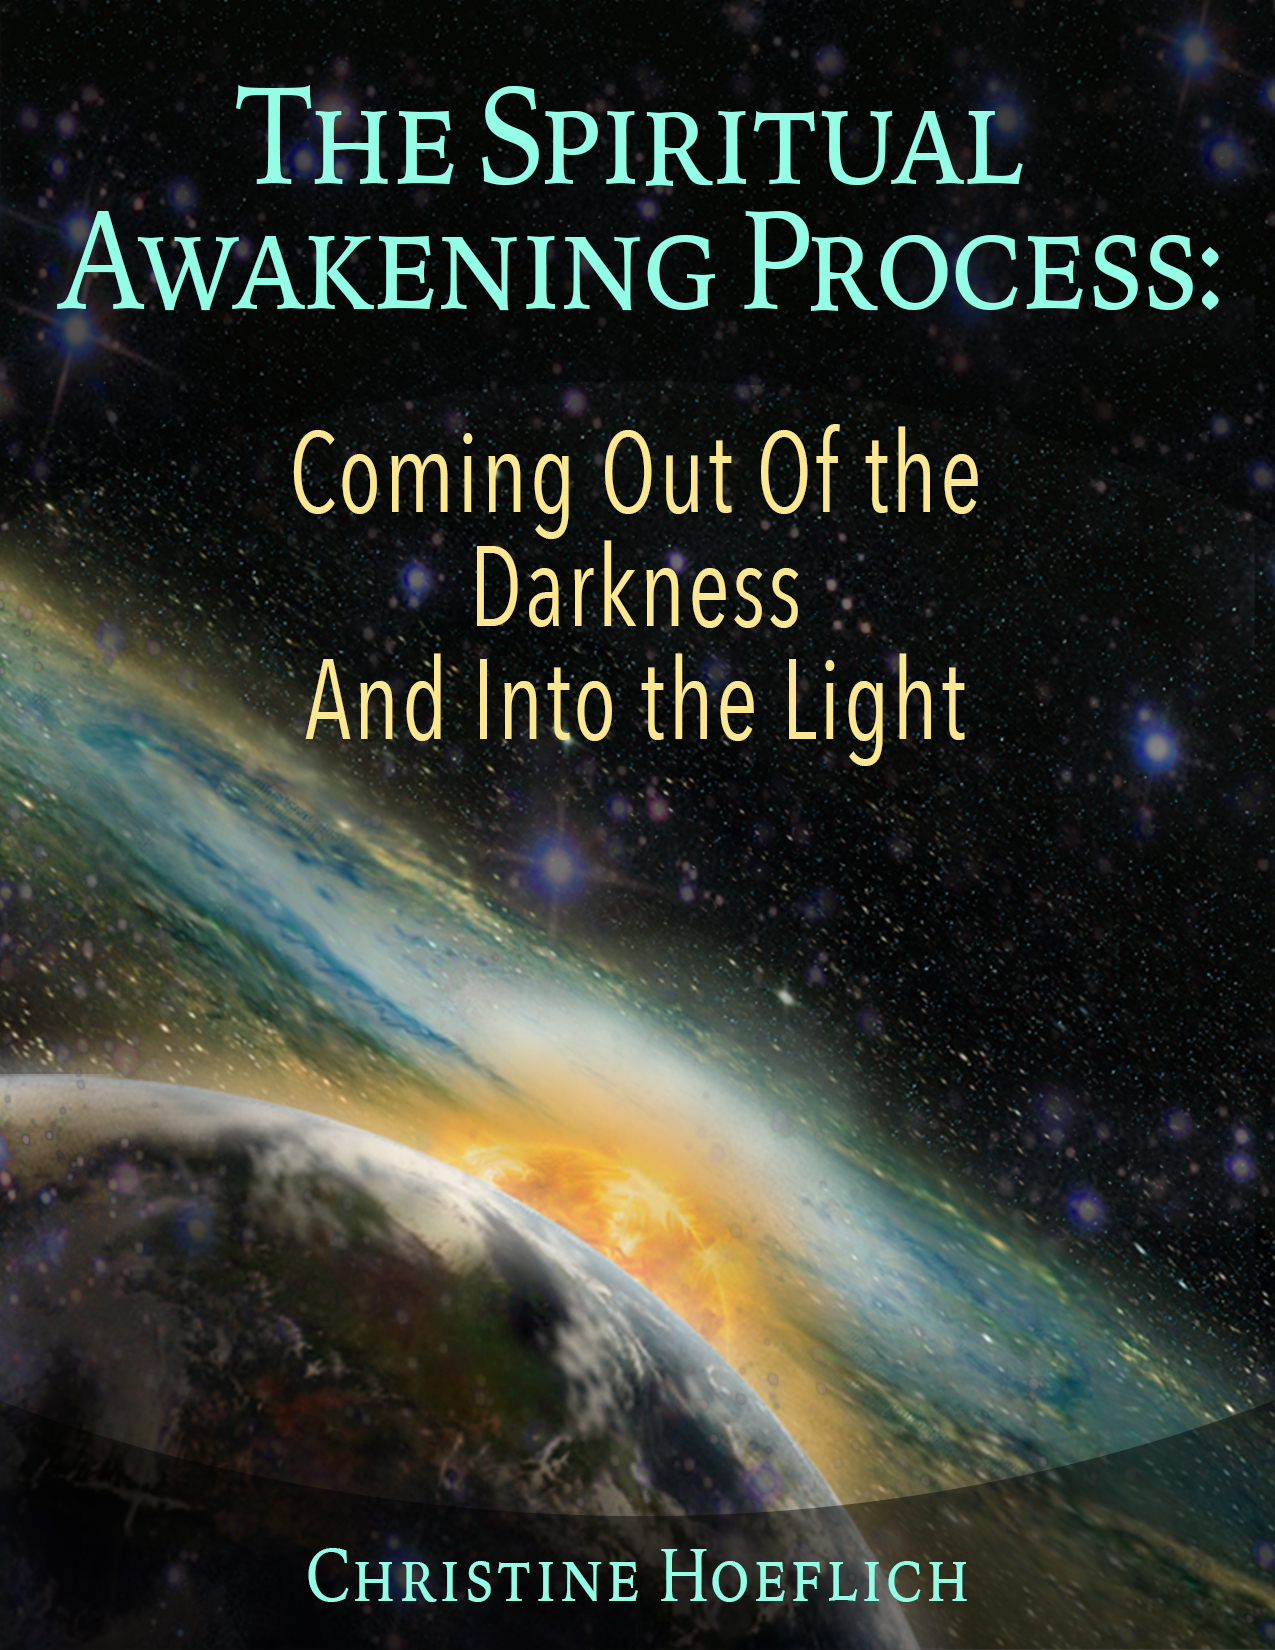 The Spiritual Awakening Process BookCover